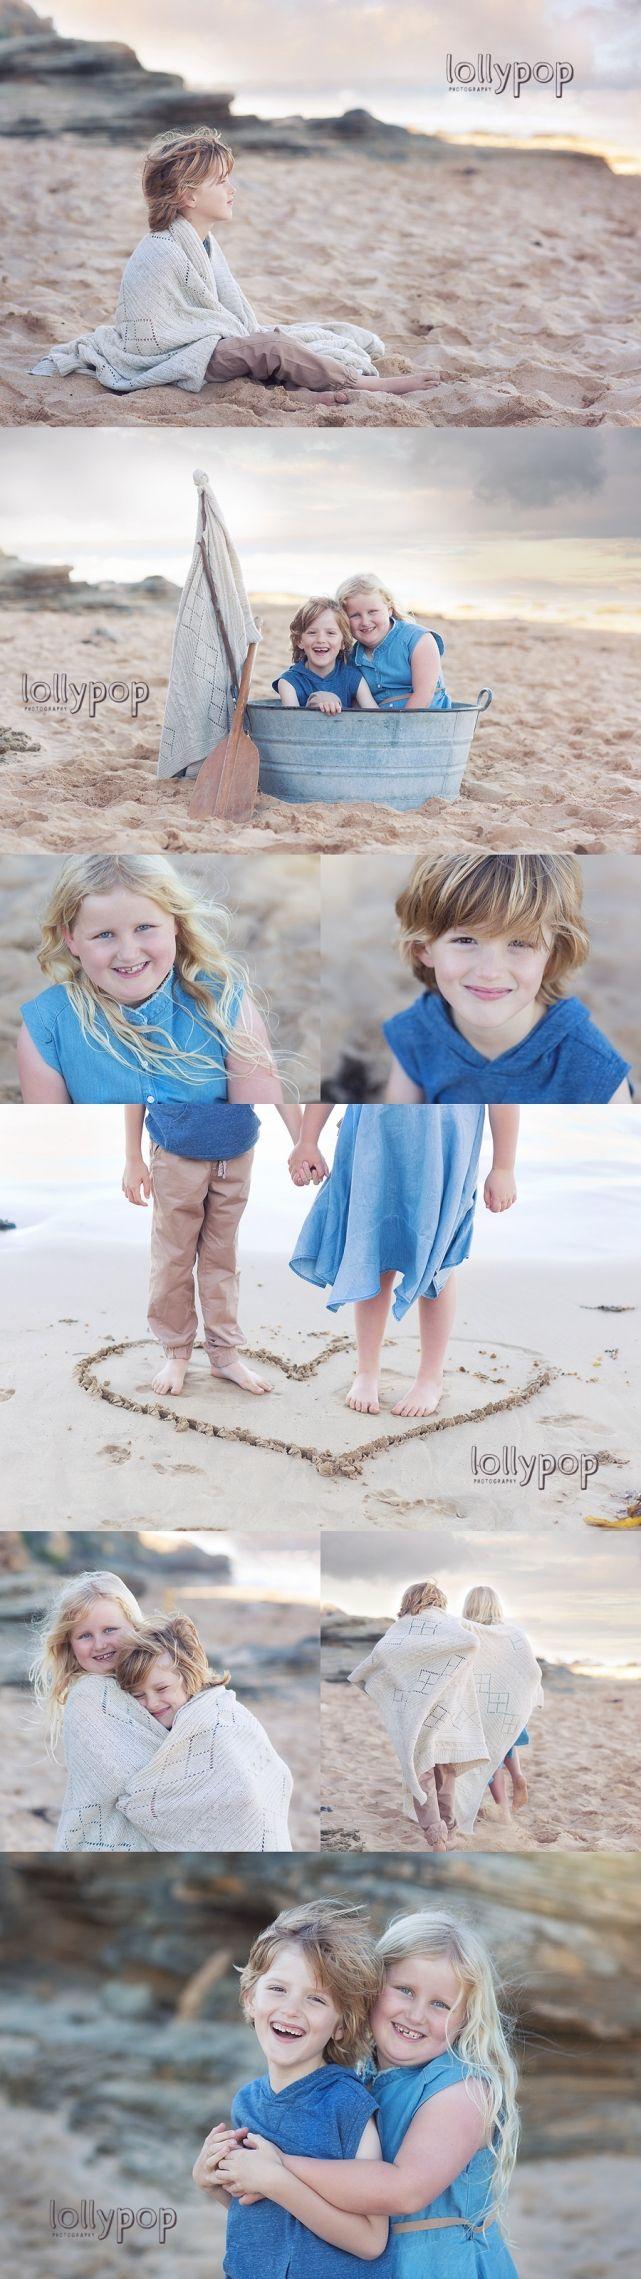 Melbourne family photographer, beach photography, children's beach photographer